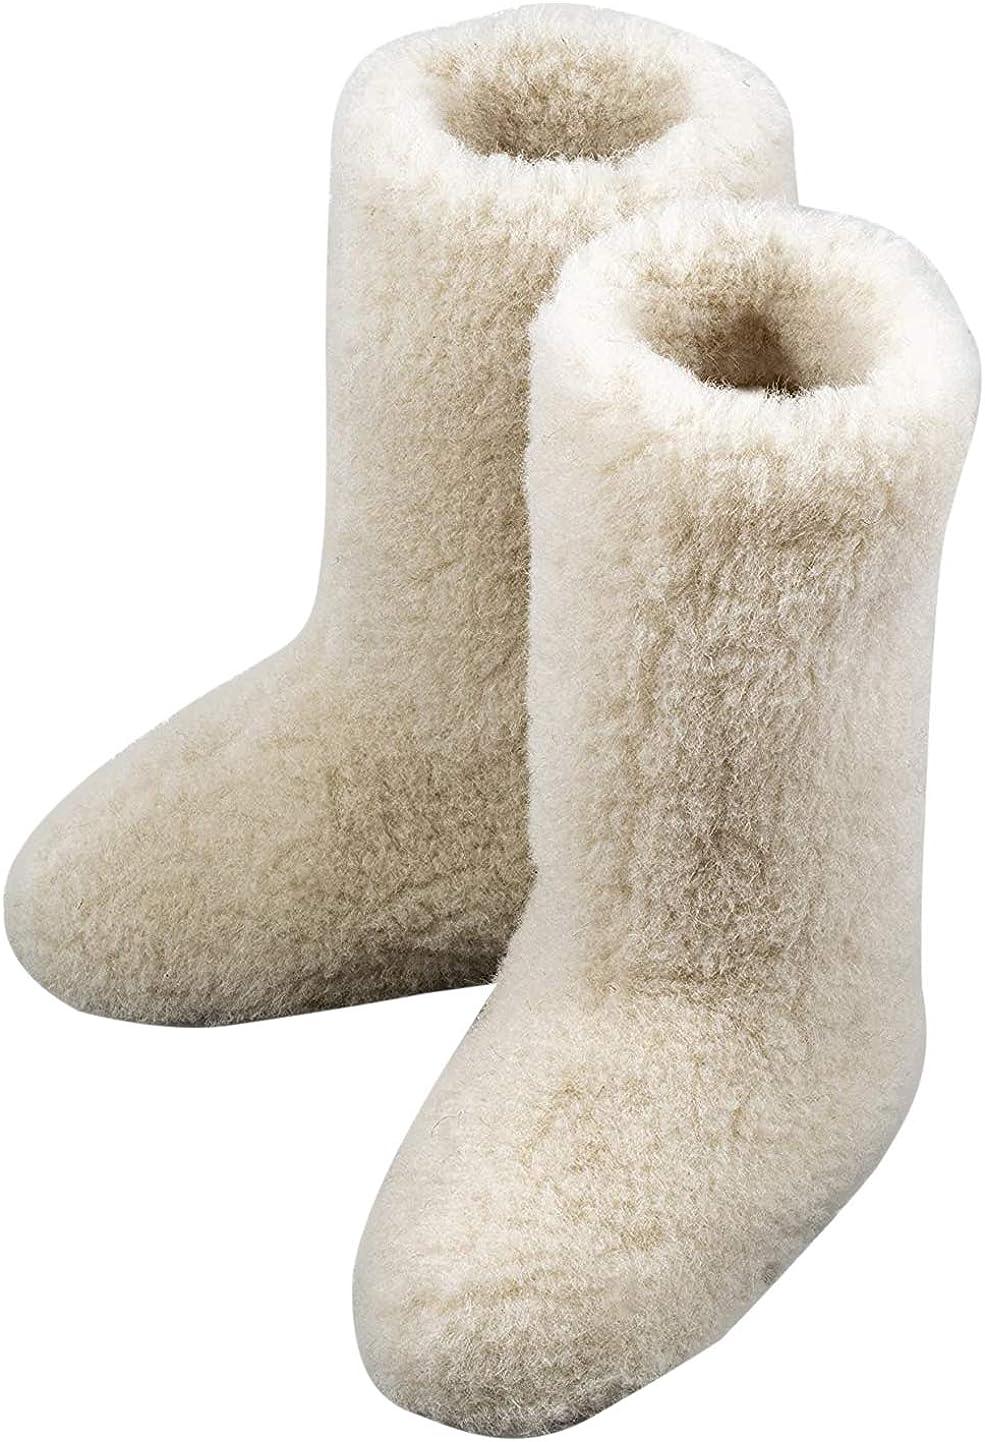 Women's Tall Calf Merino Wool Boots